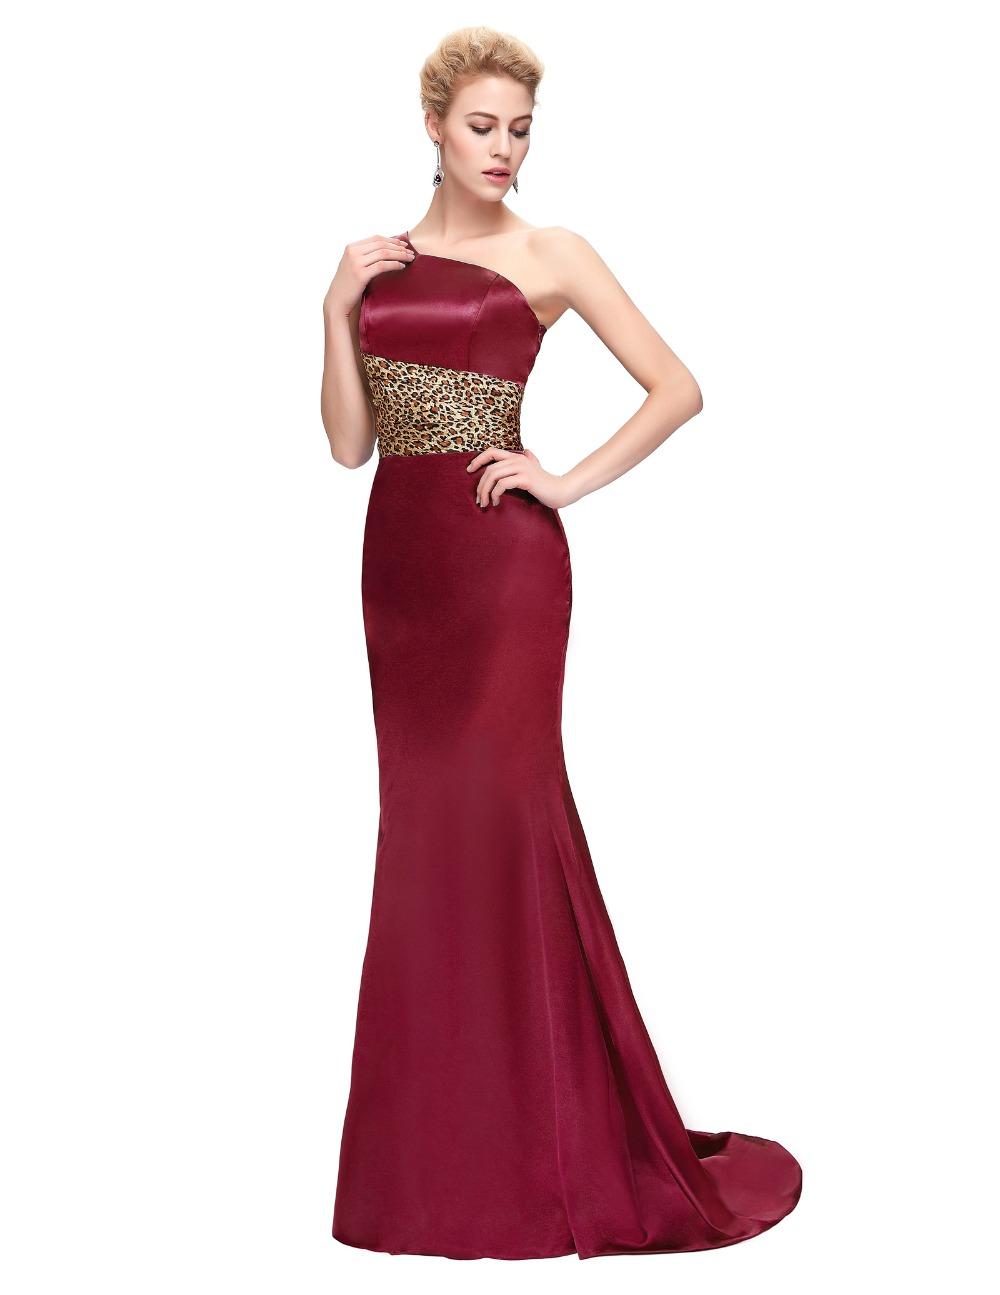 Robe longue rouge 123